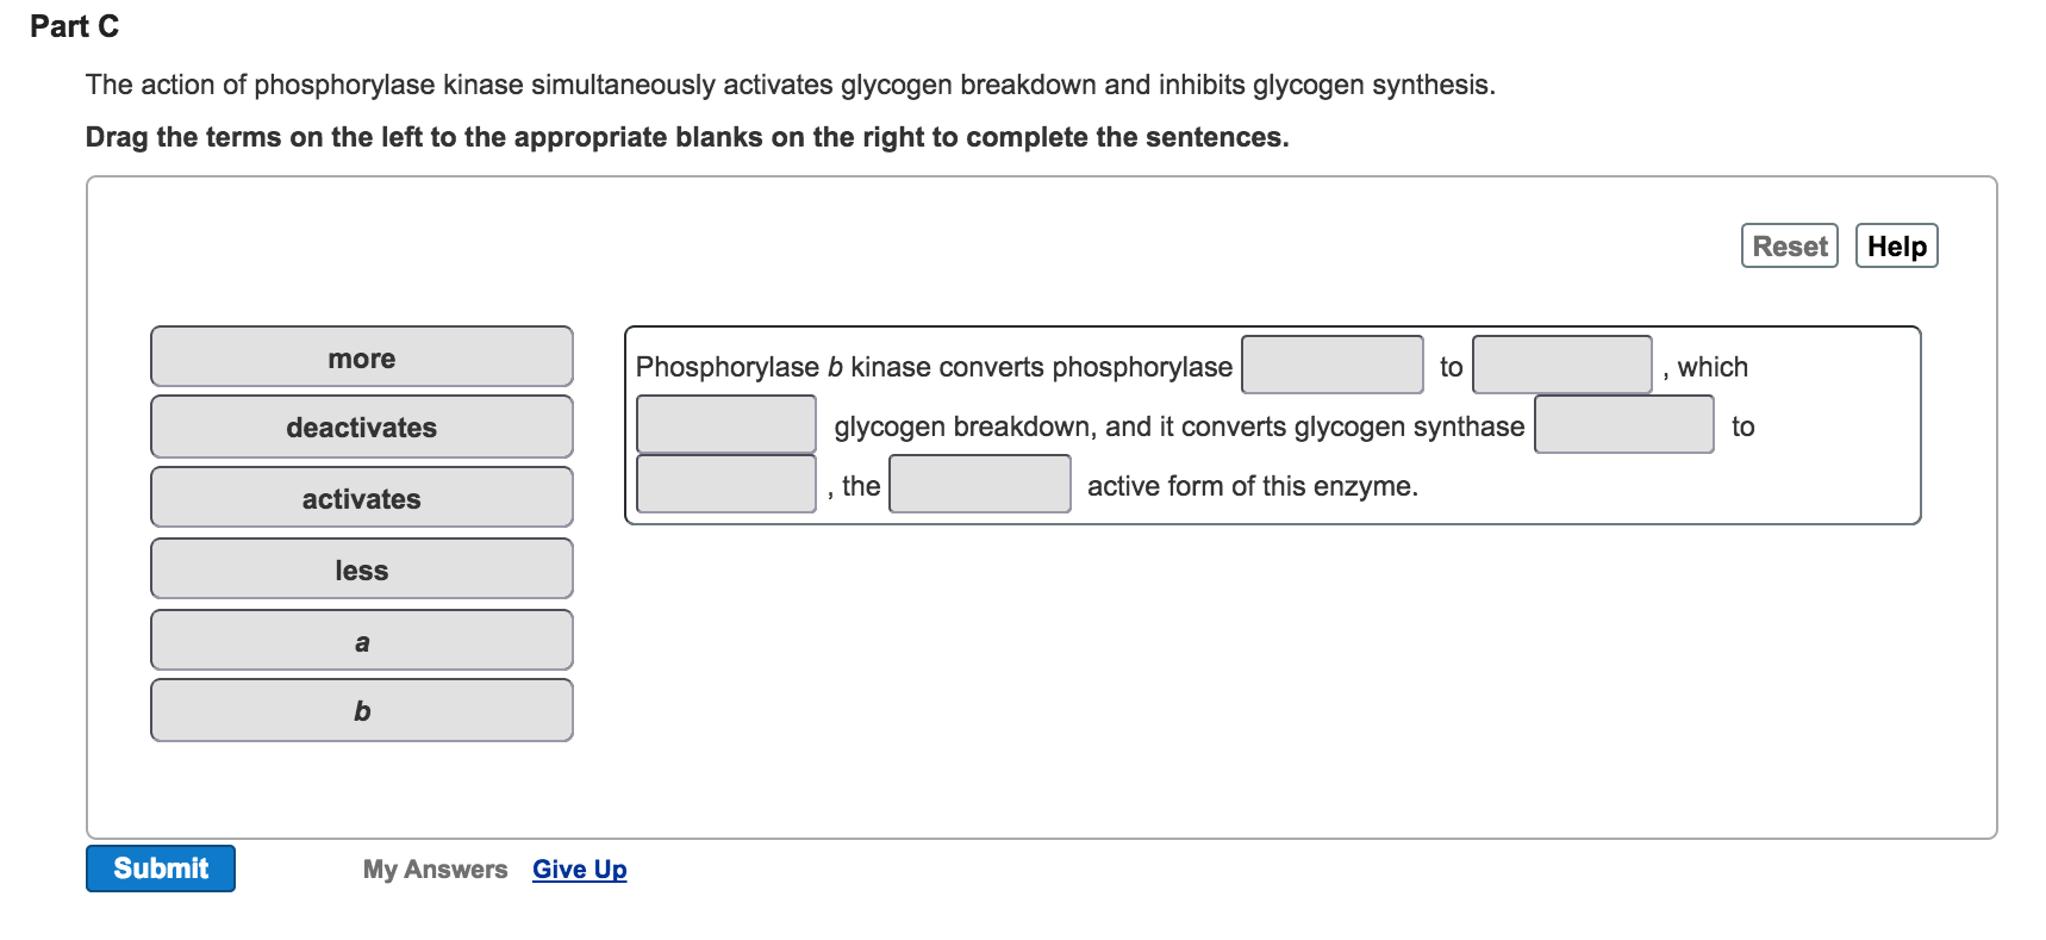 what activates phosphorylase kinase b